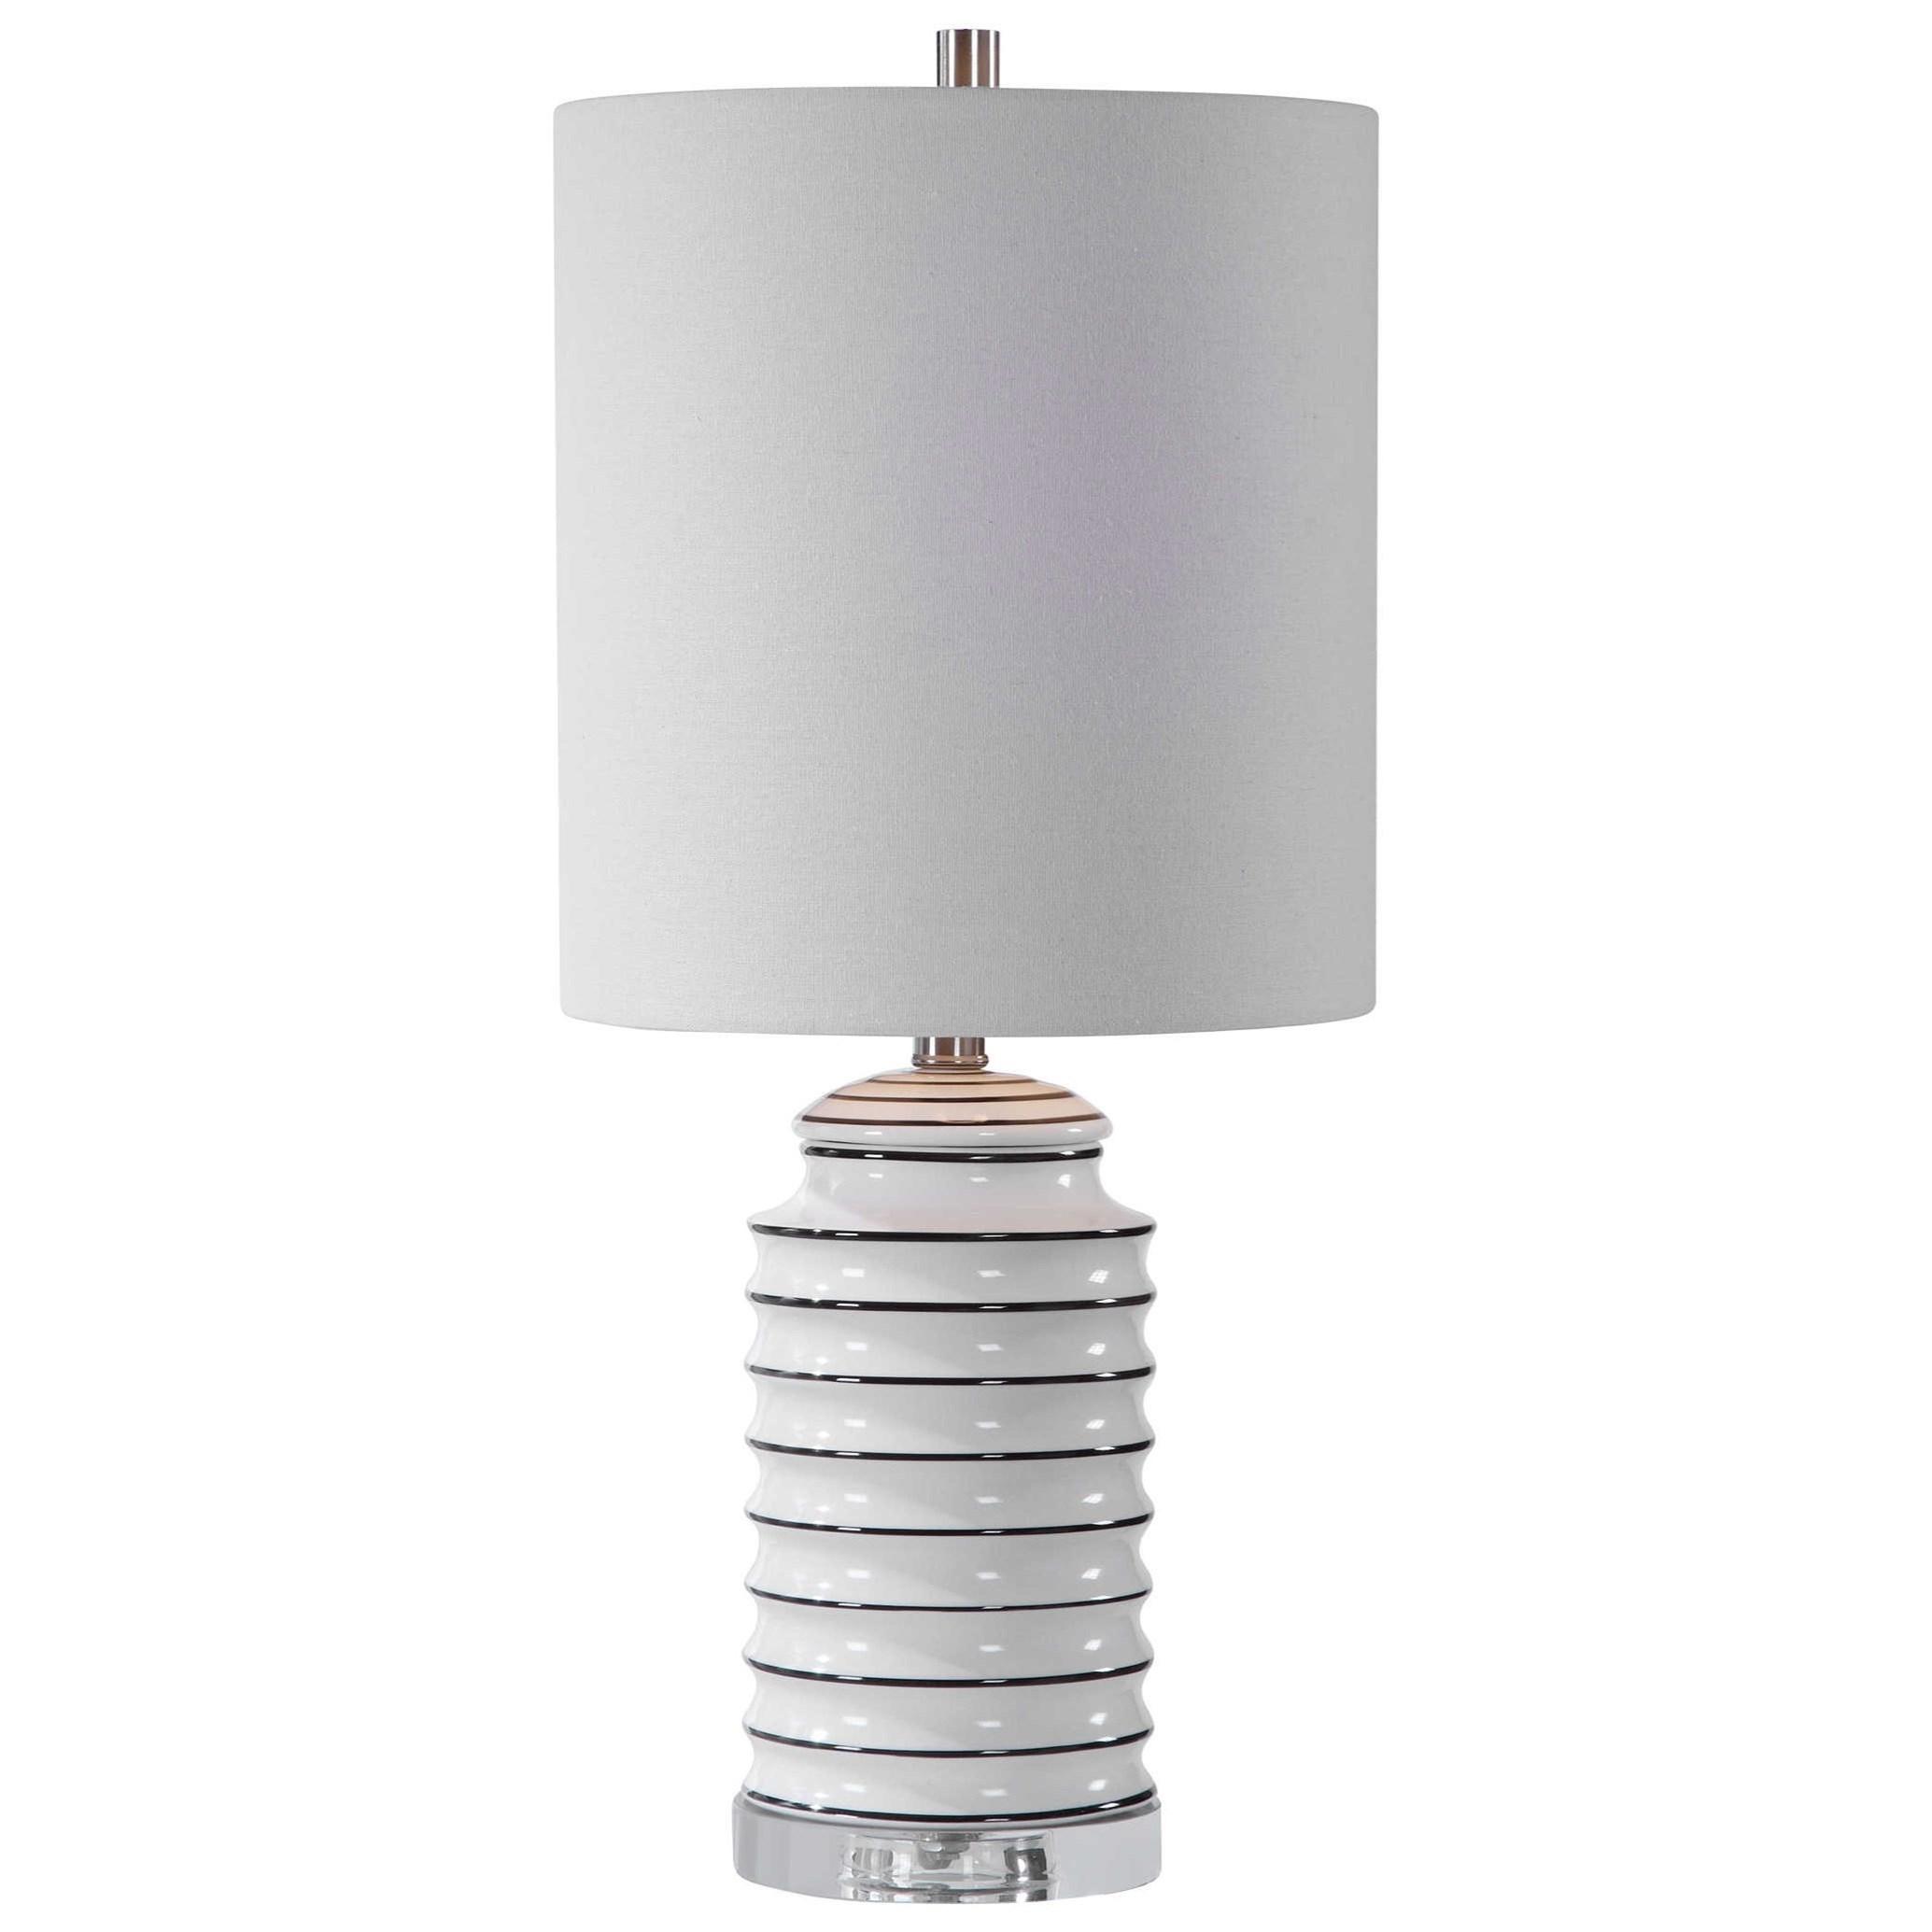 Rayas White Table Lamp